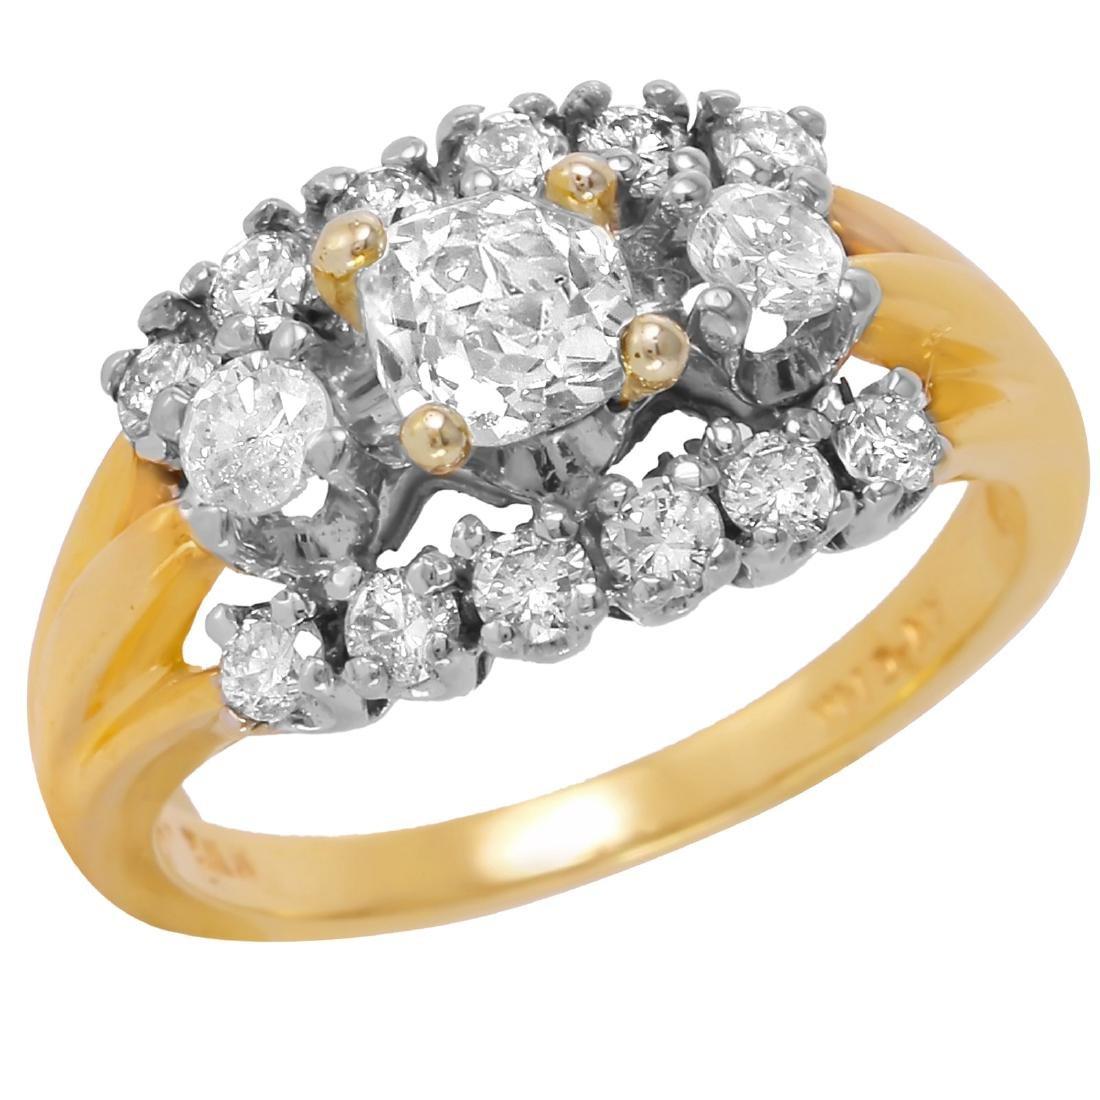 14KT Two Tone Gold Art Deco Diamond Ring